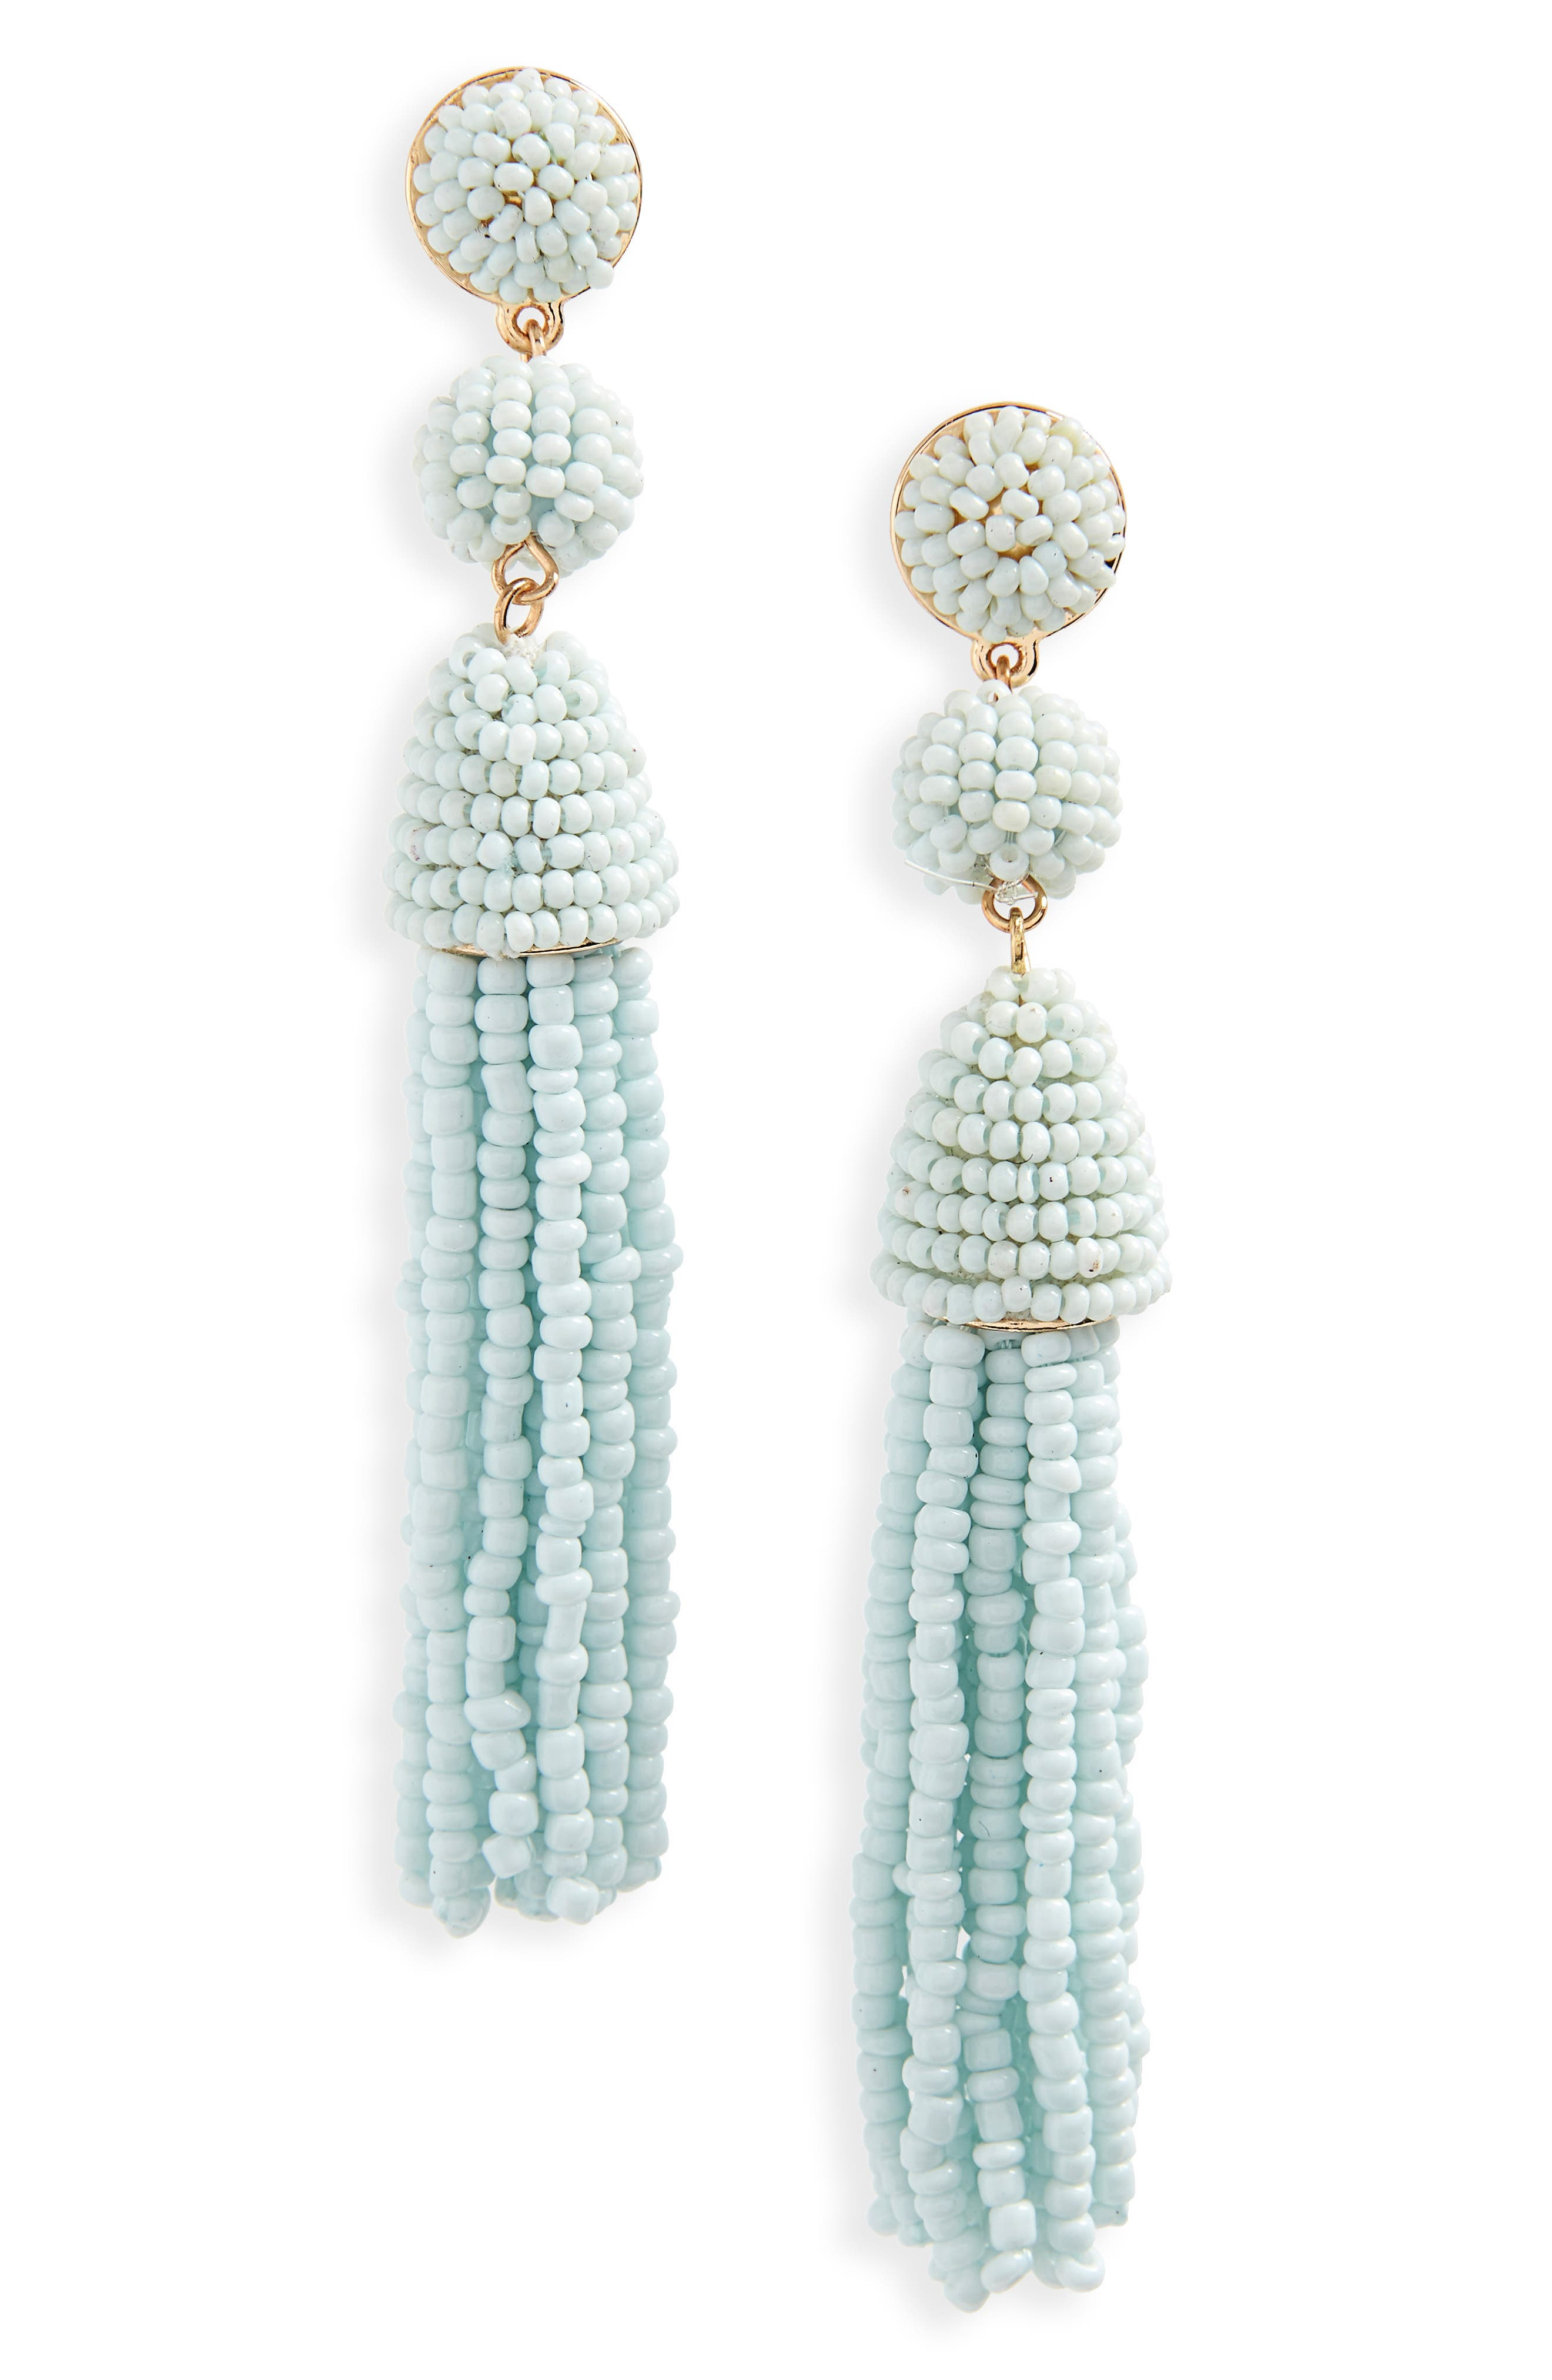 Granita Beaded Tassel Earrings,                             Main thumbnail 1, color,                             Pale Blue